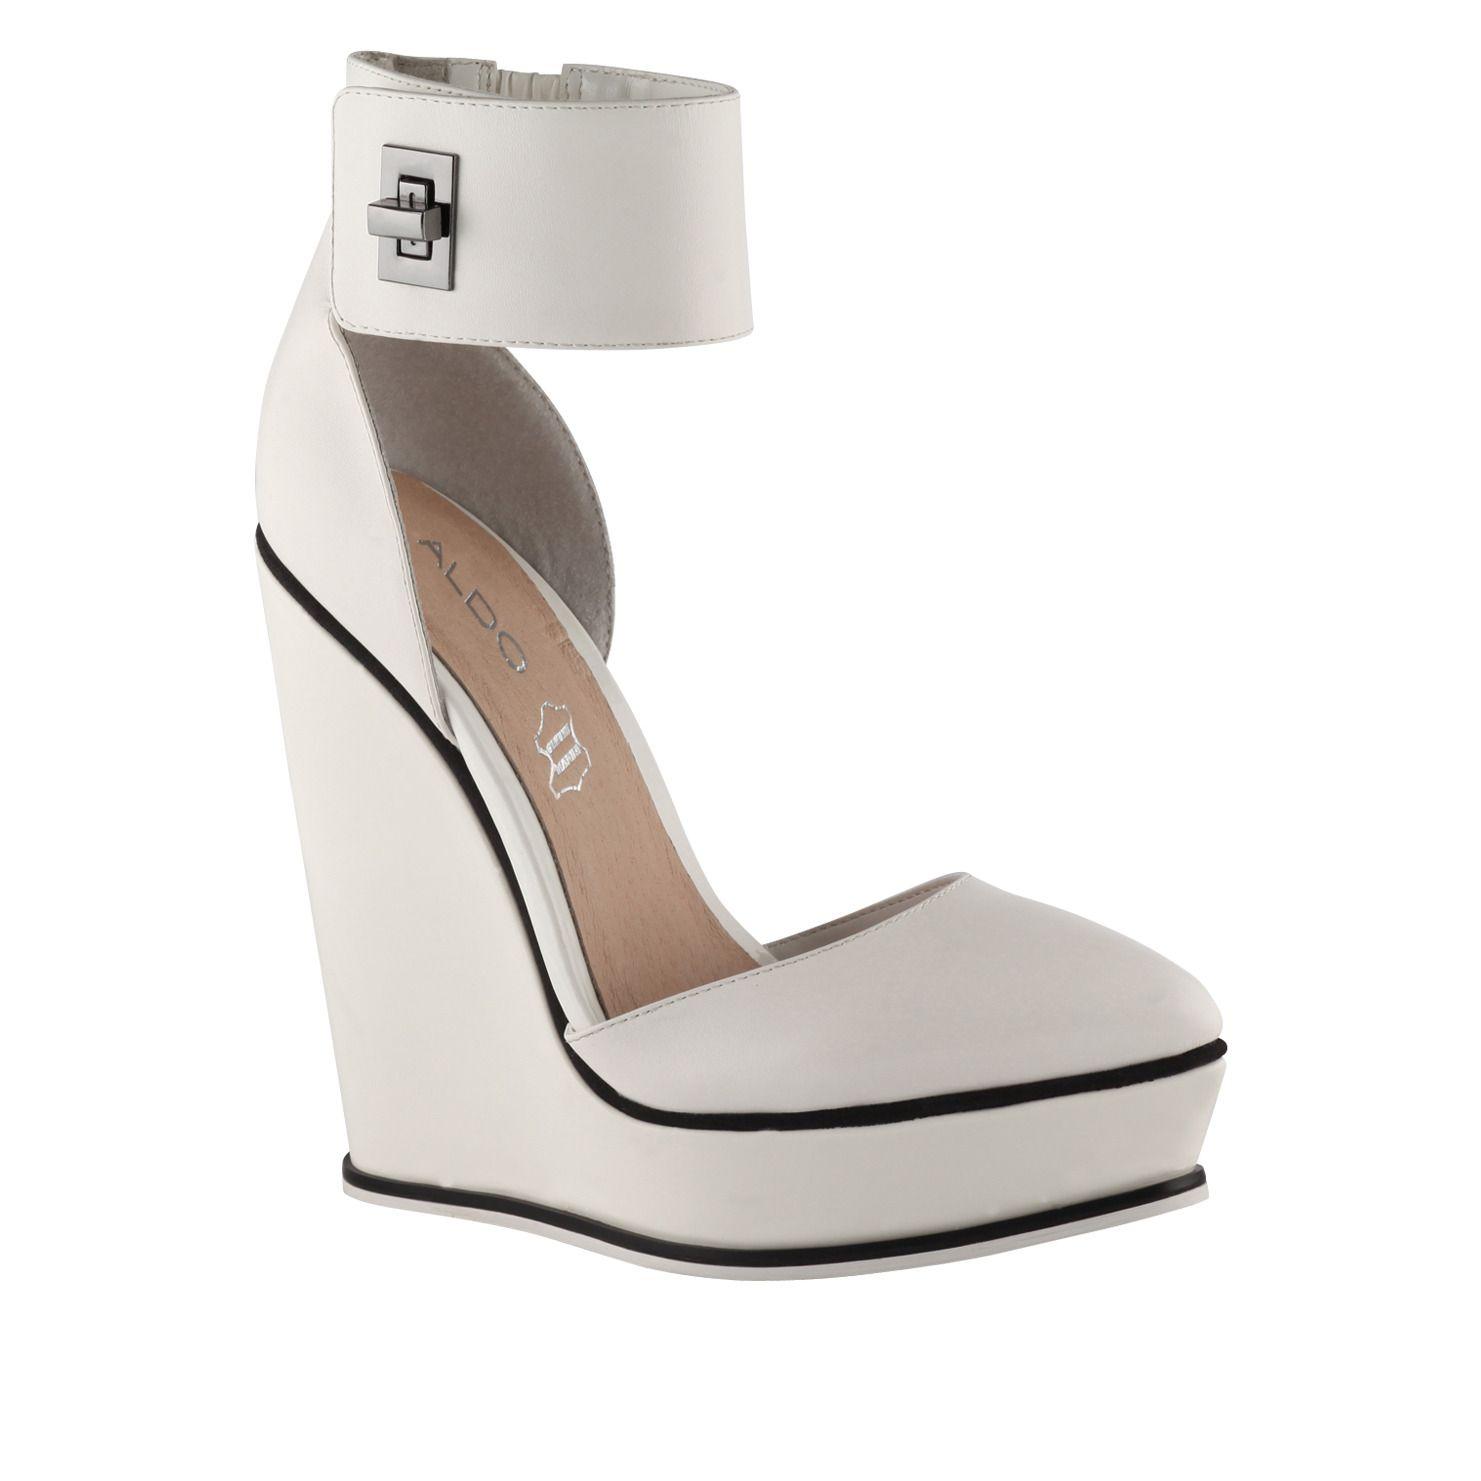 ALDO Shoes. | Womens shoes wedges